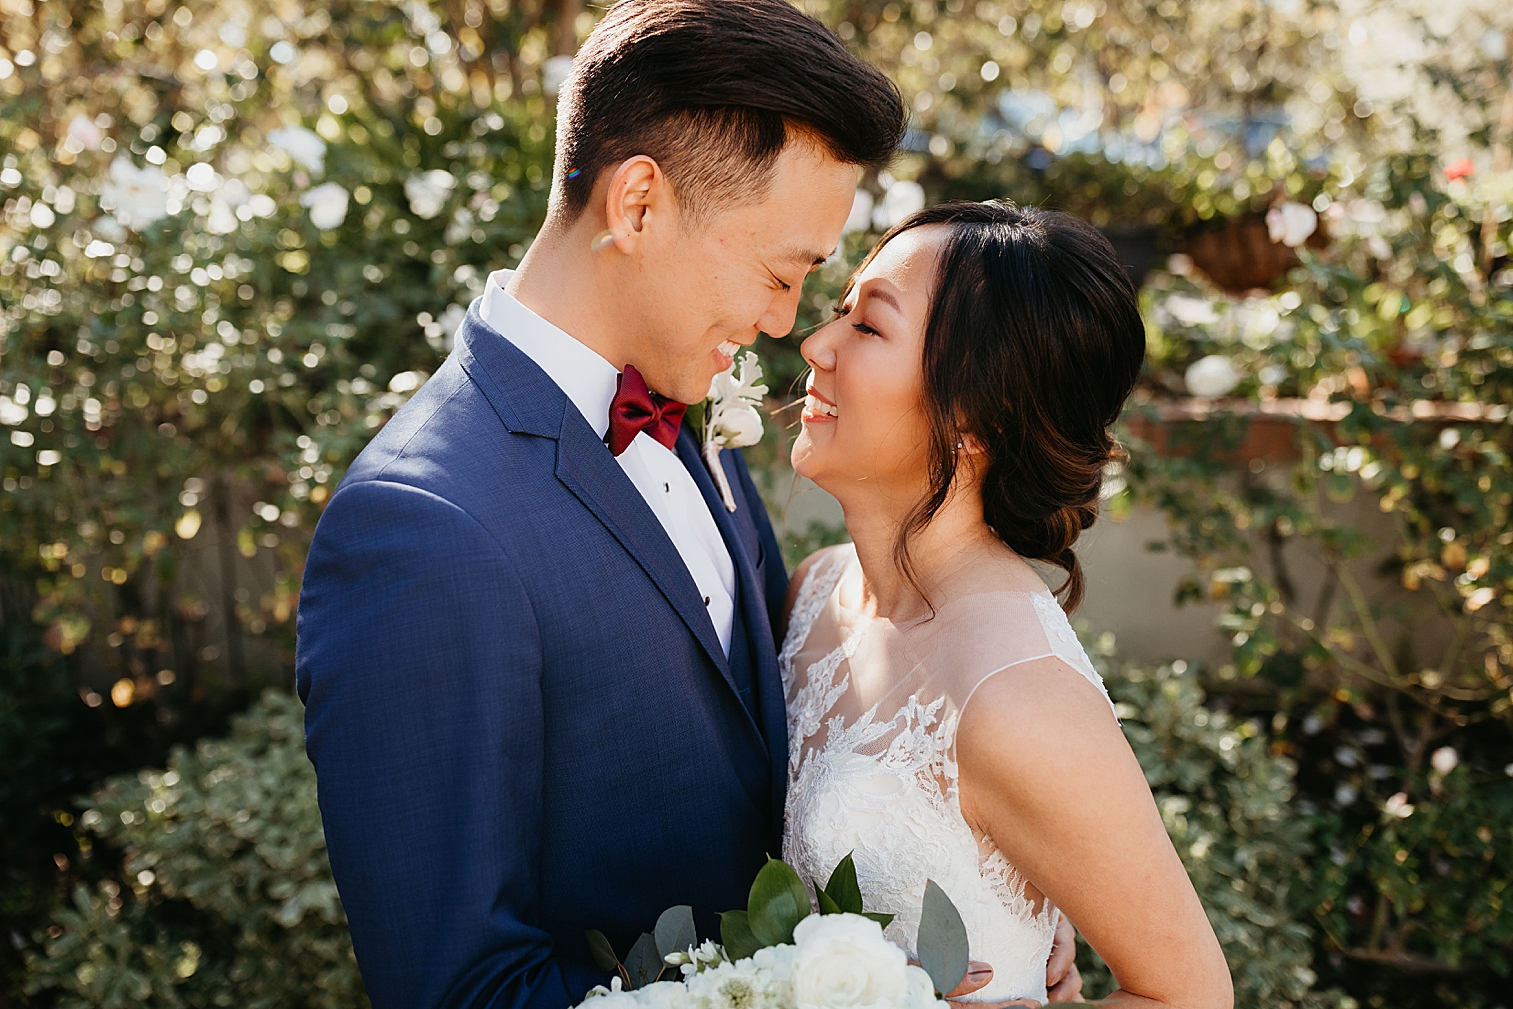 Secret-Garden-Rancho-Santa-Fe-Wedding-40.jpg